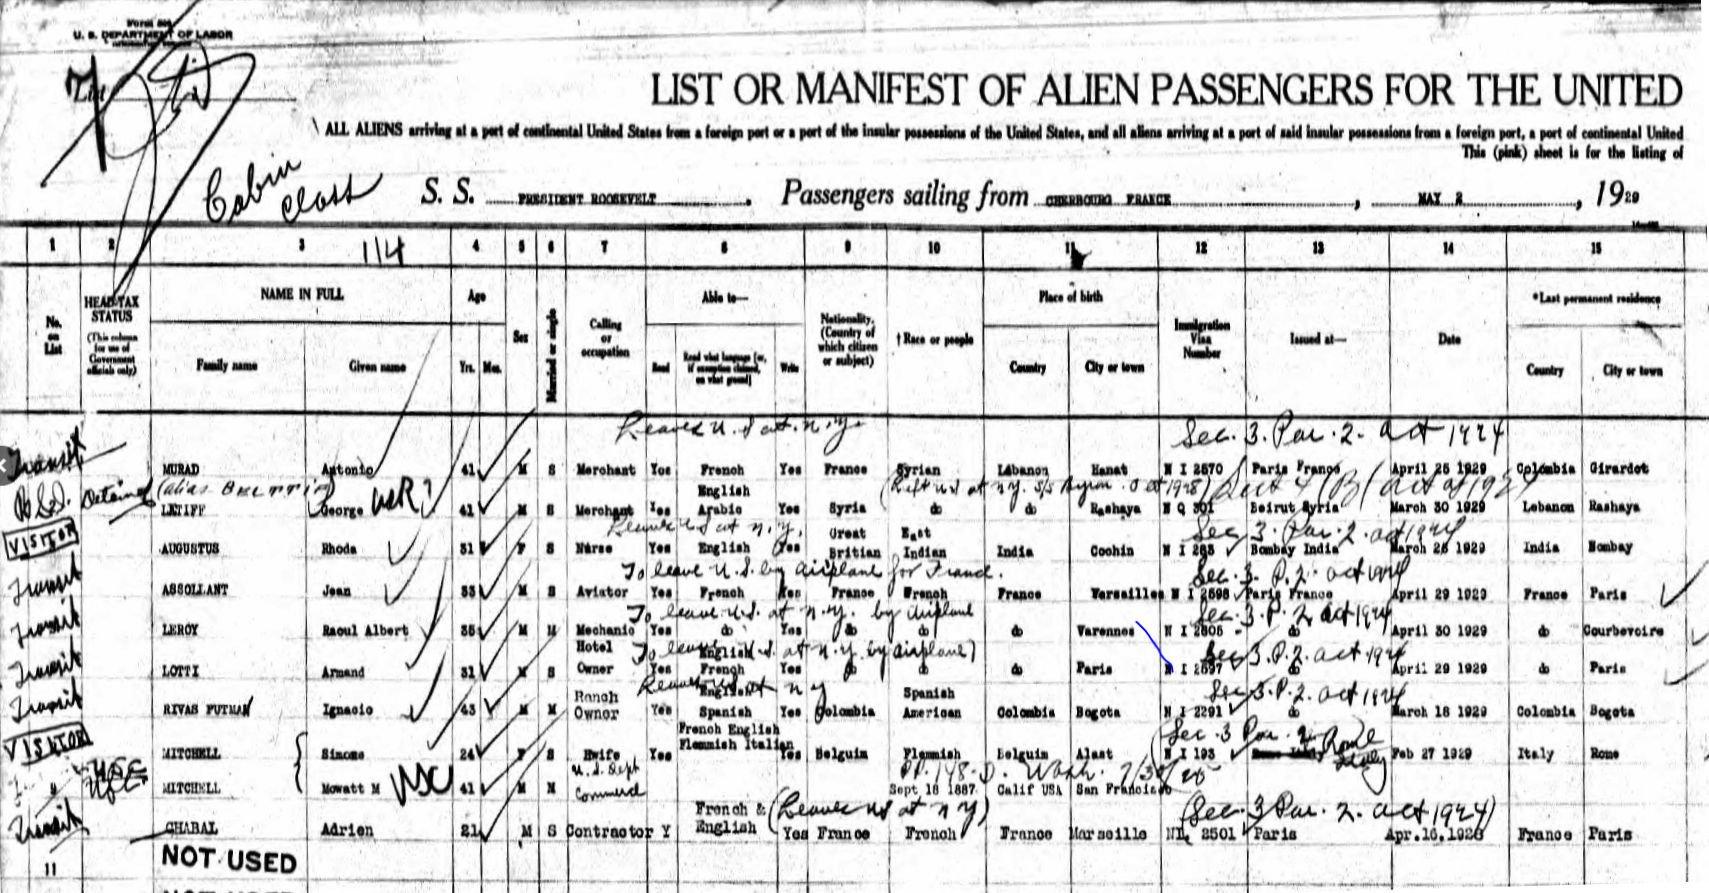 Assolant & Lotti Passenger List